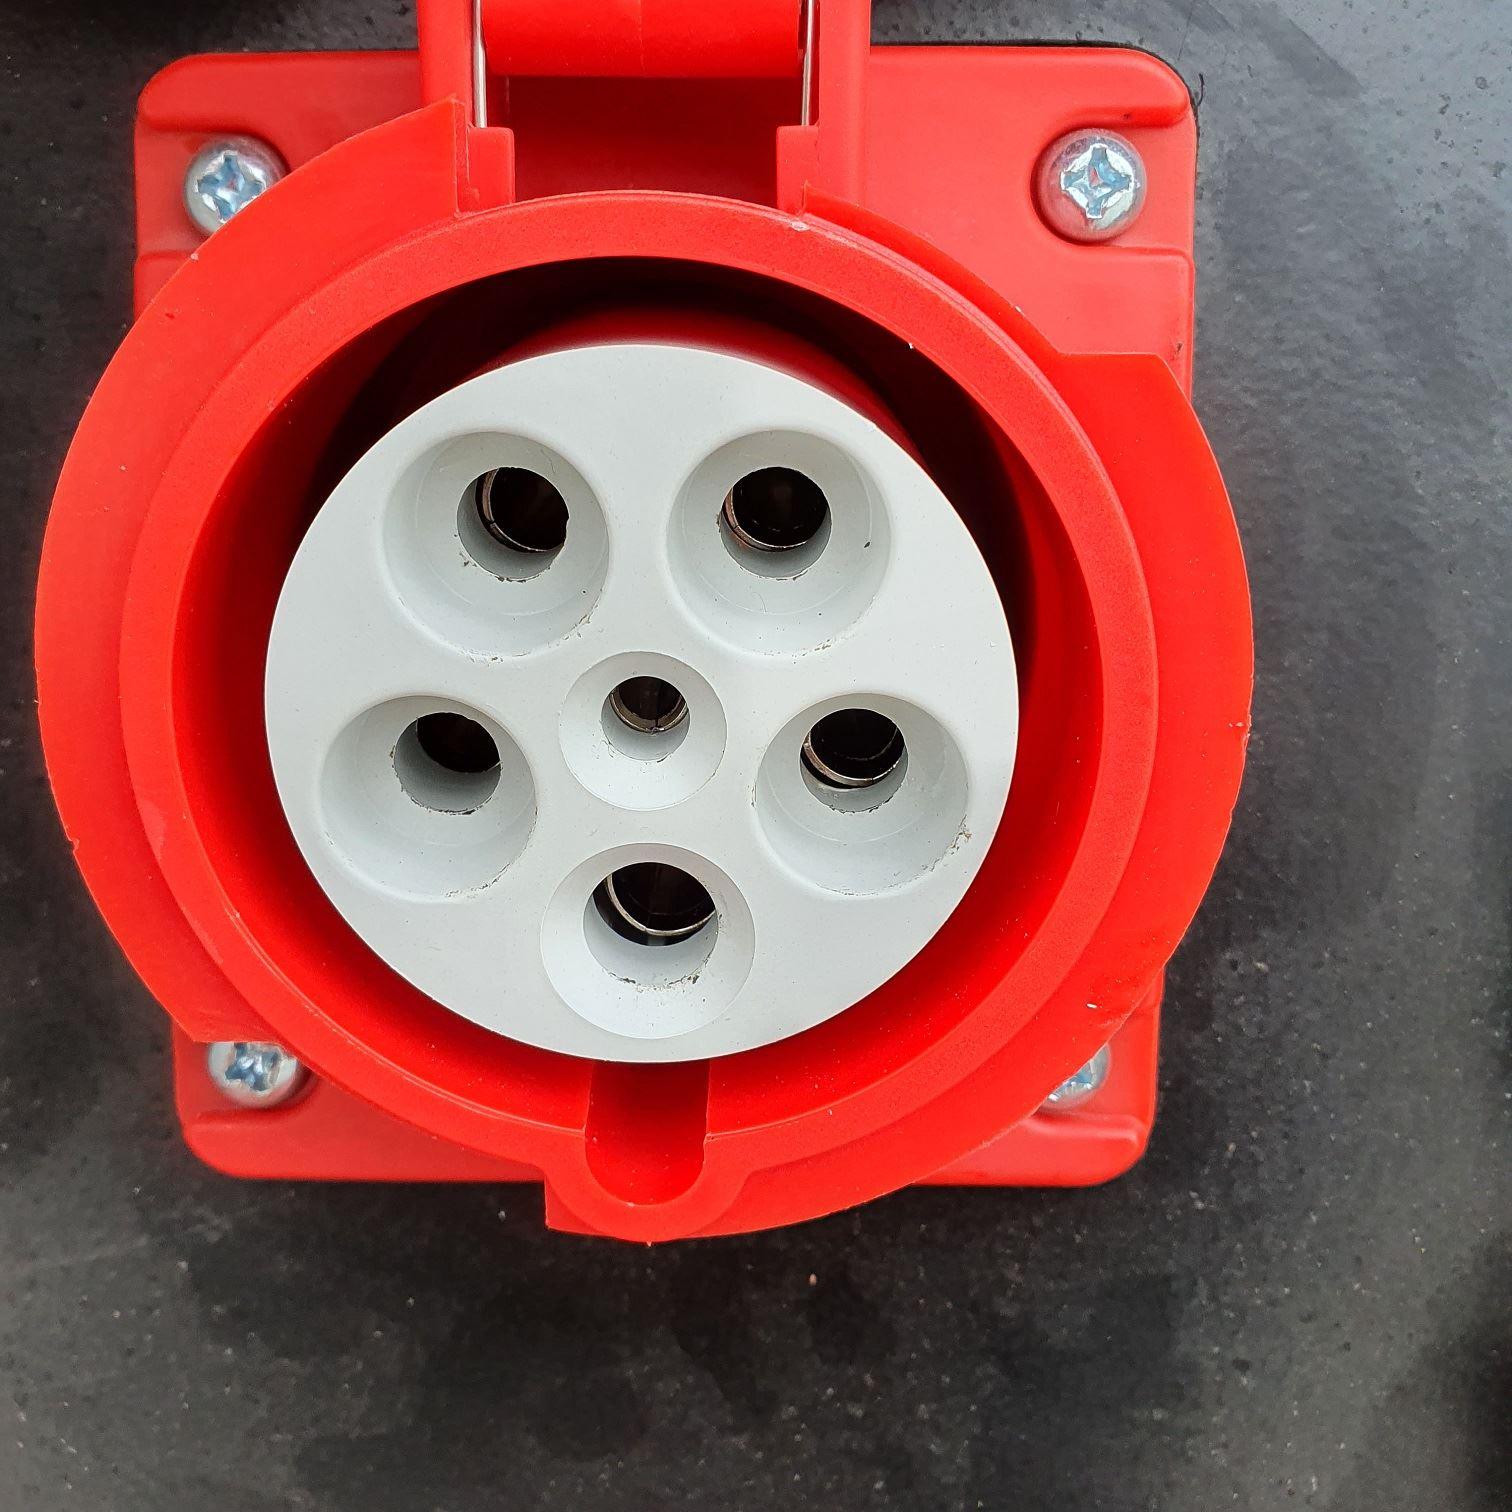 Picture of 150 KVA Generator